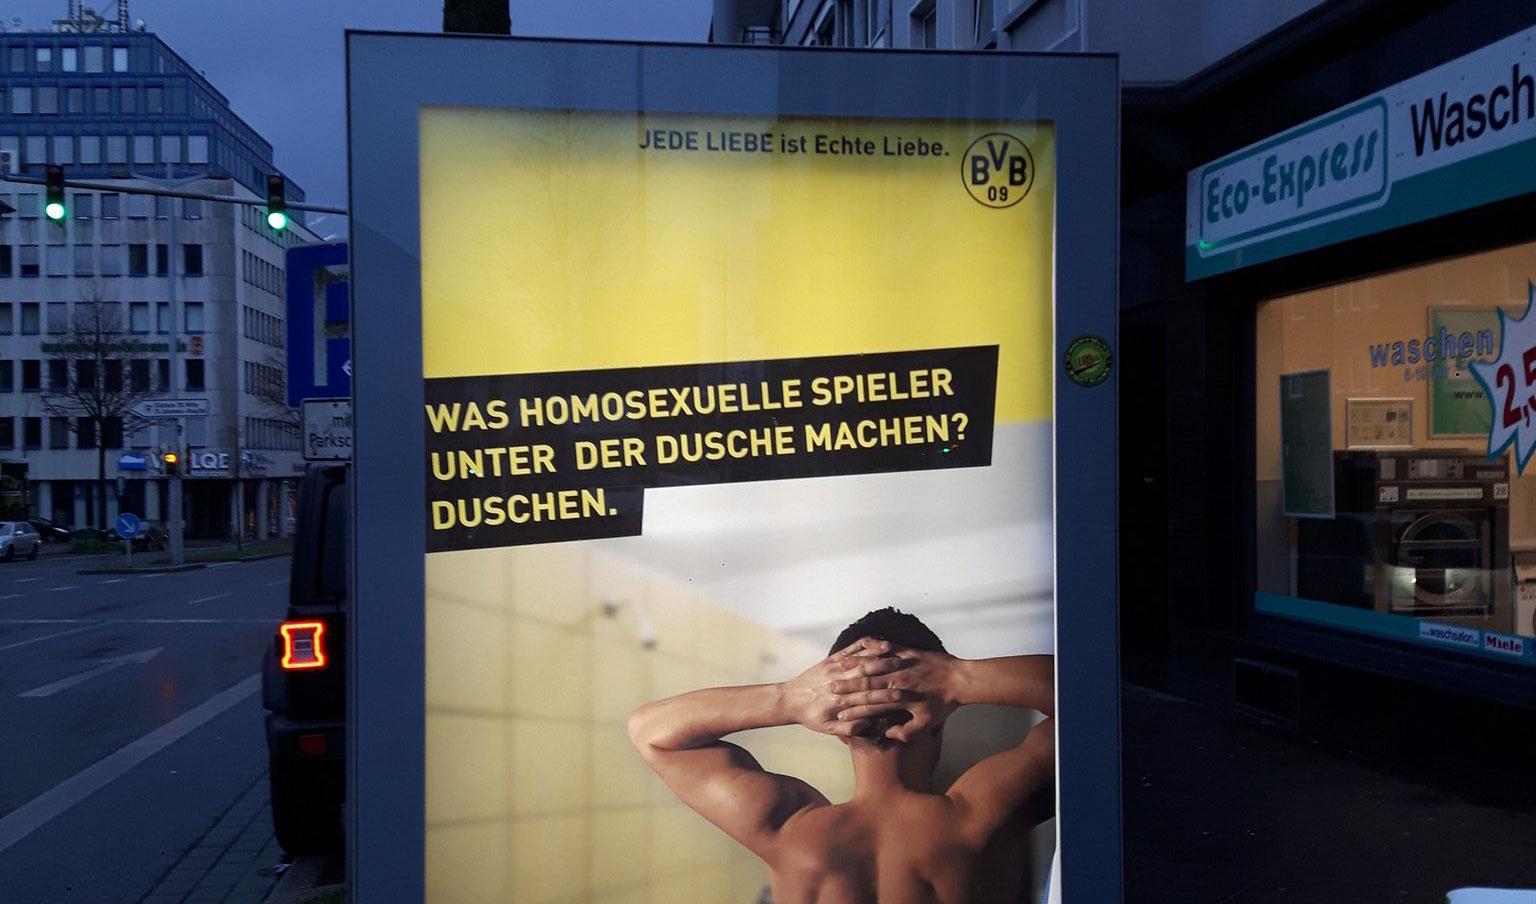 BVB Fake Plakatkampagne gegen Homophobie in Dortmund